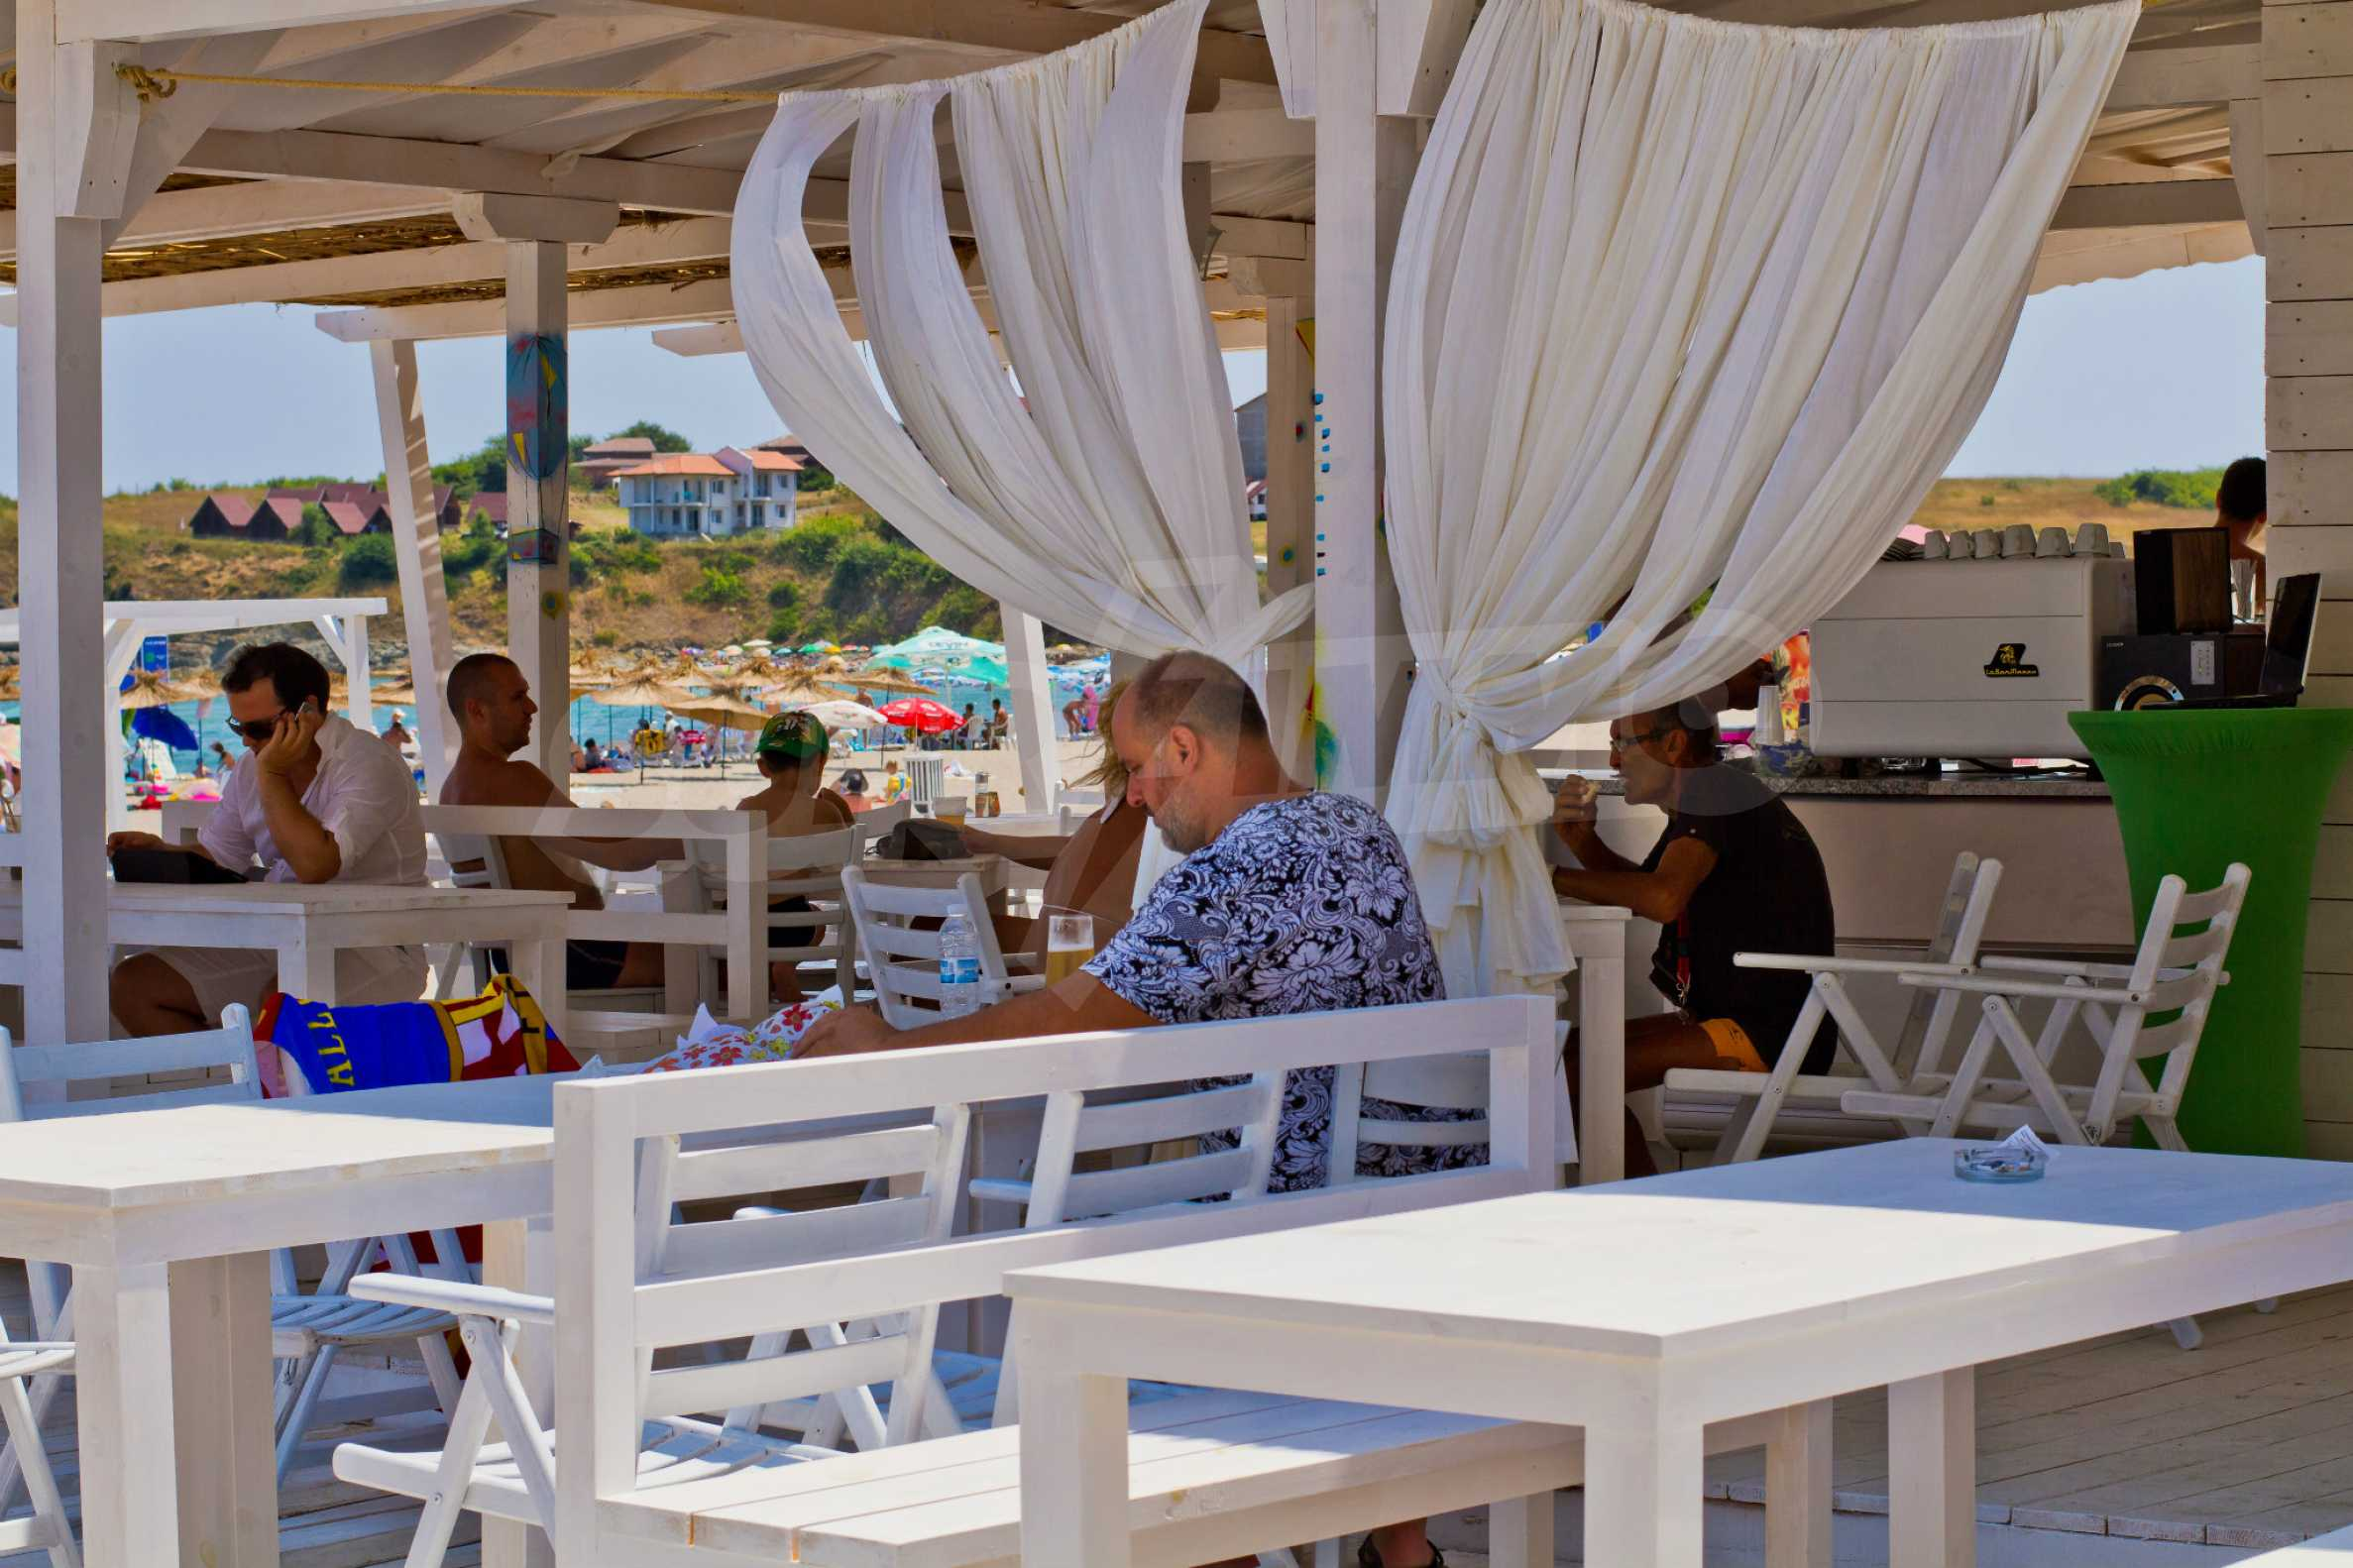 Примеа Бийч Резиденс / Primea Beach Residence 8